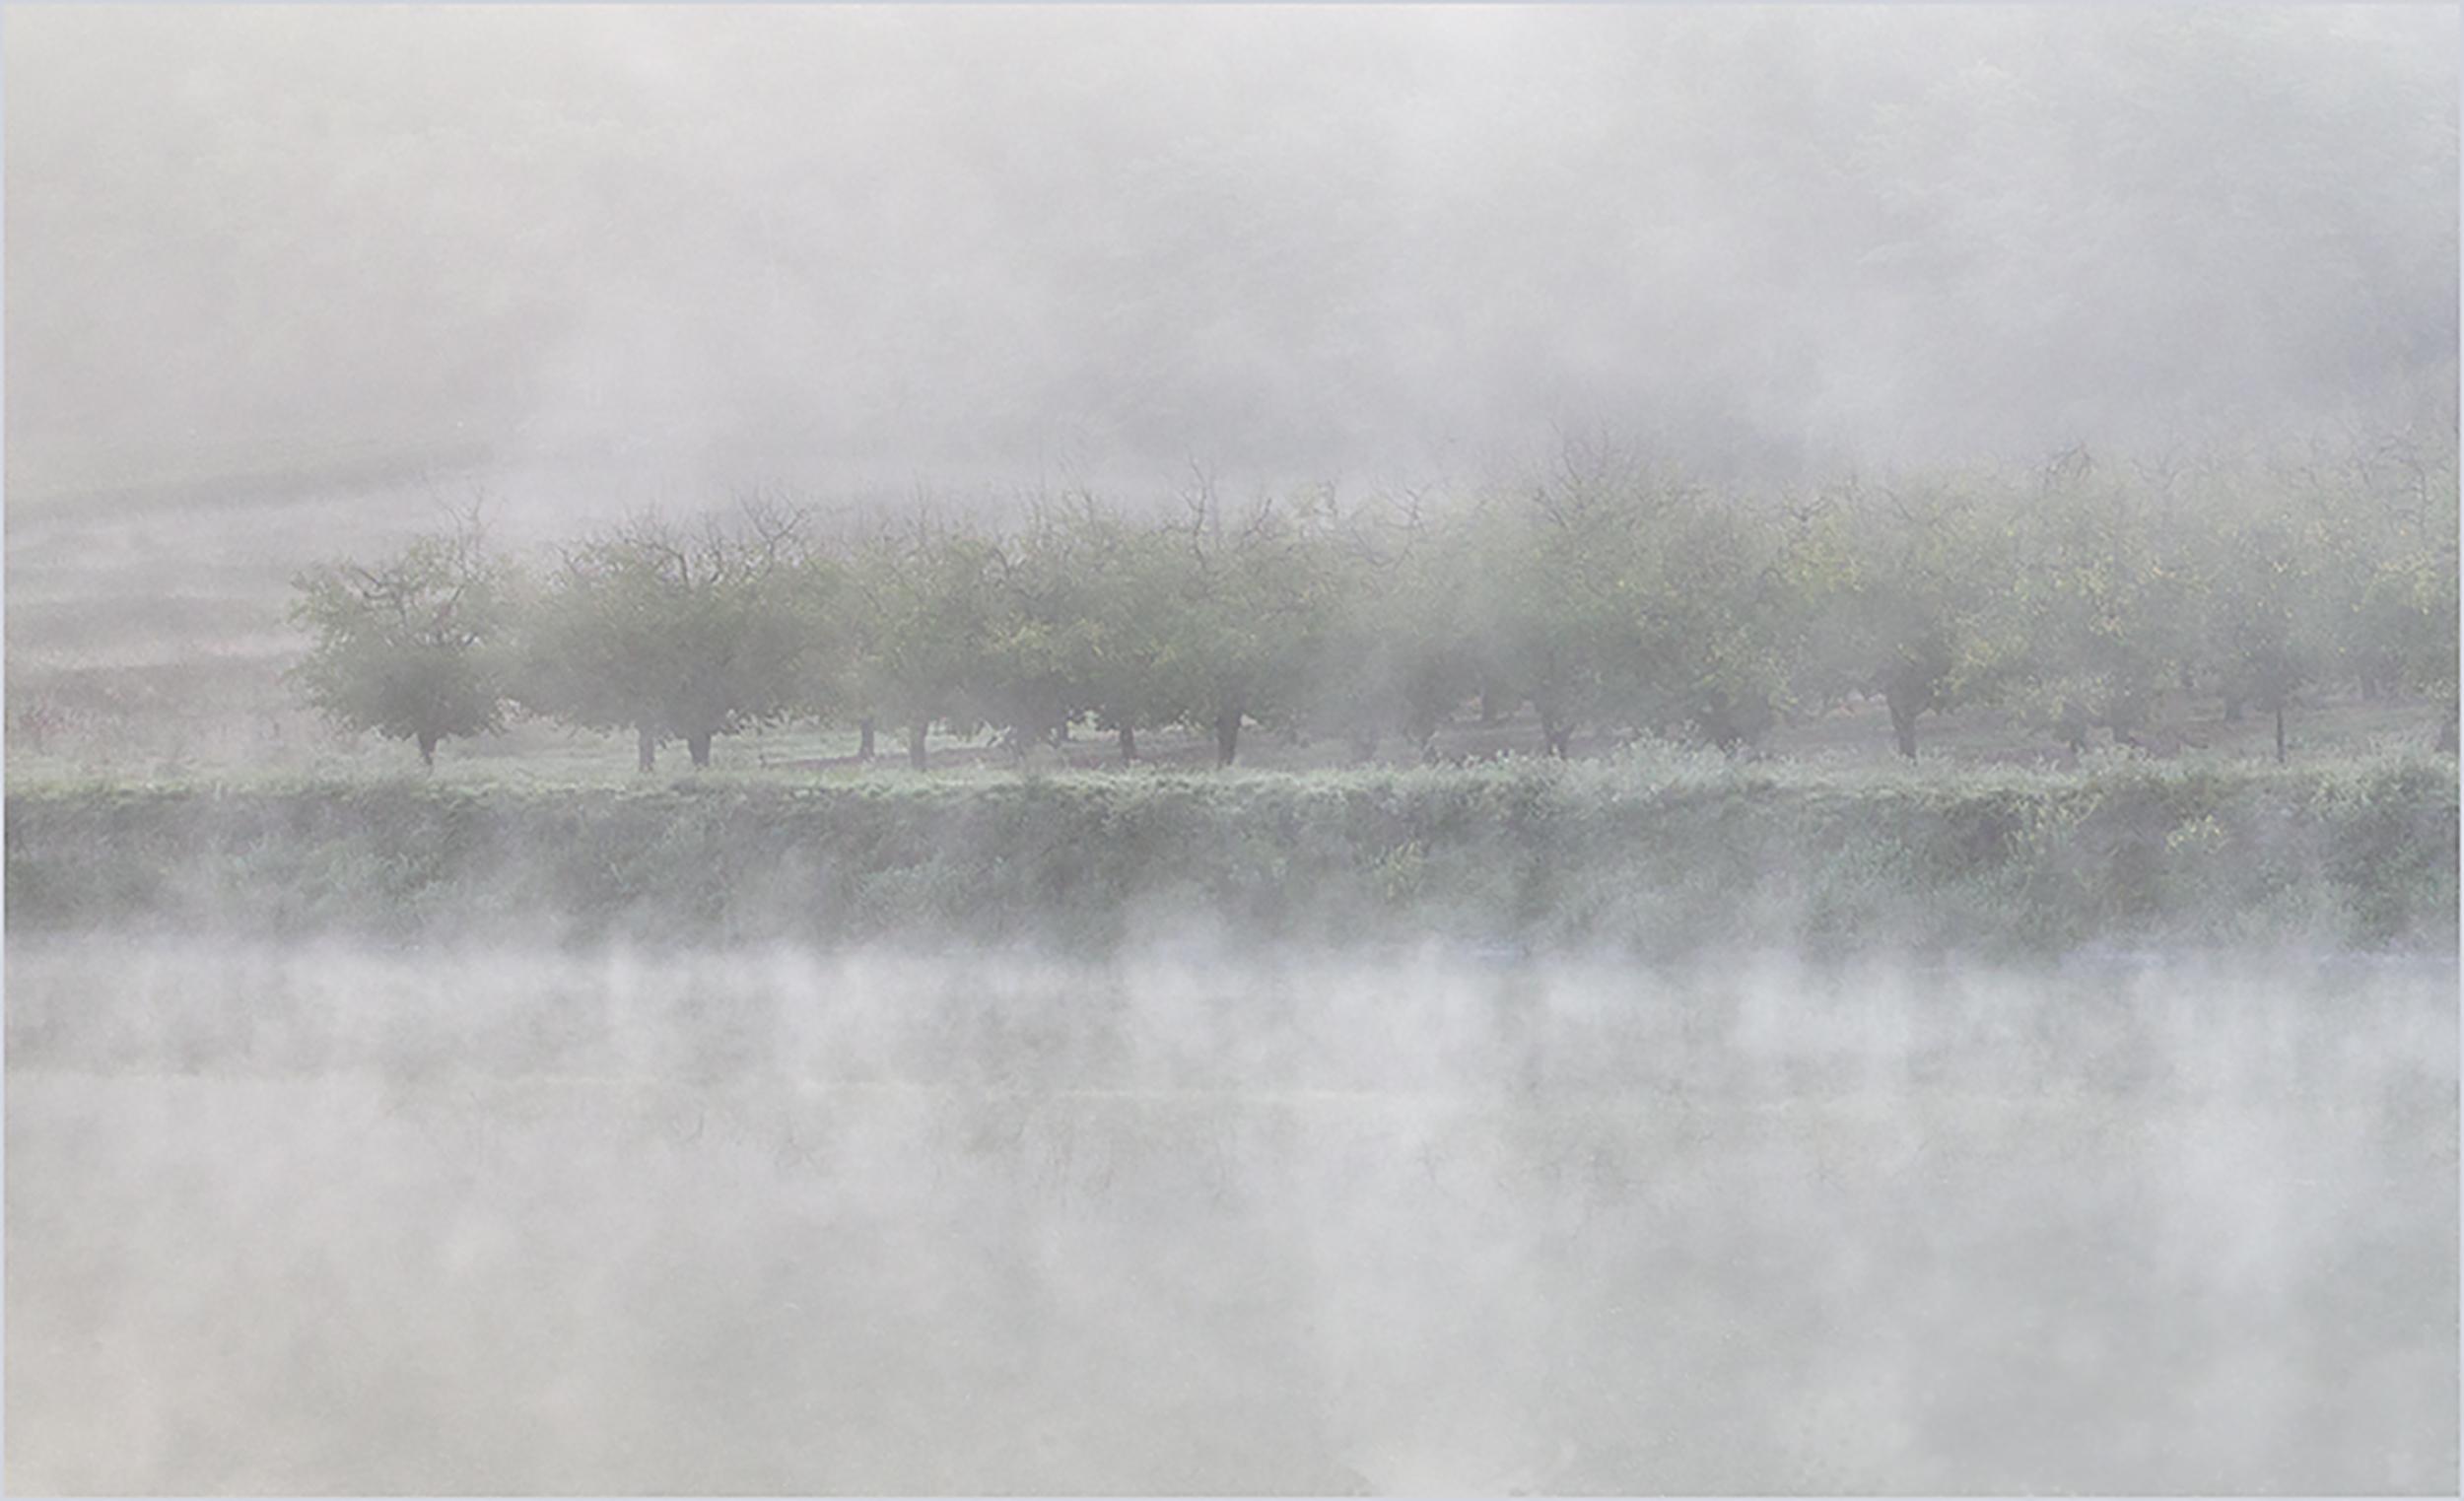 Trees in the Mist.jpg